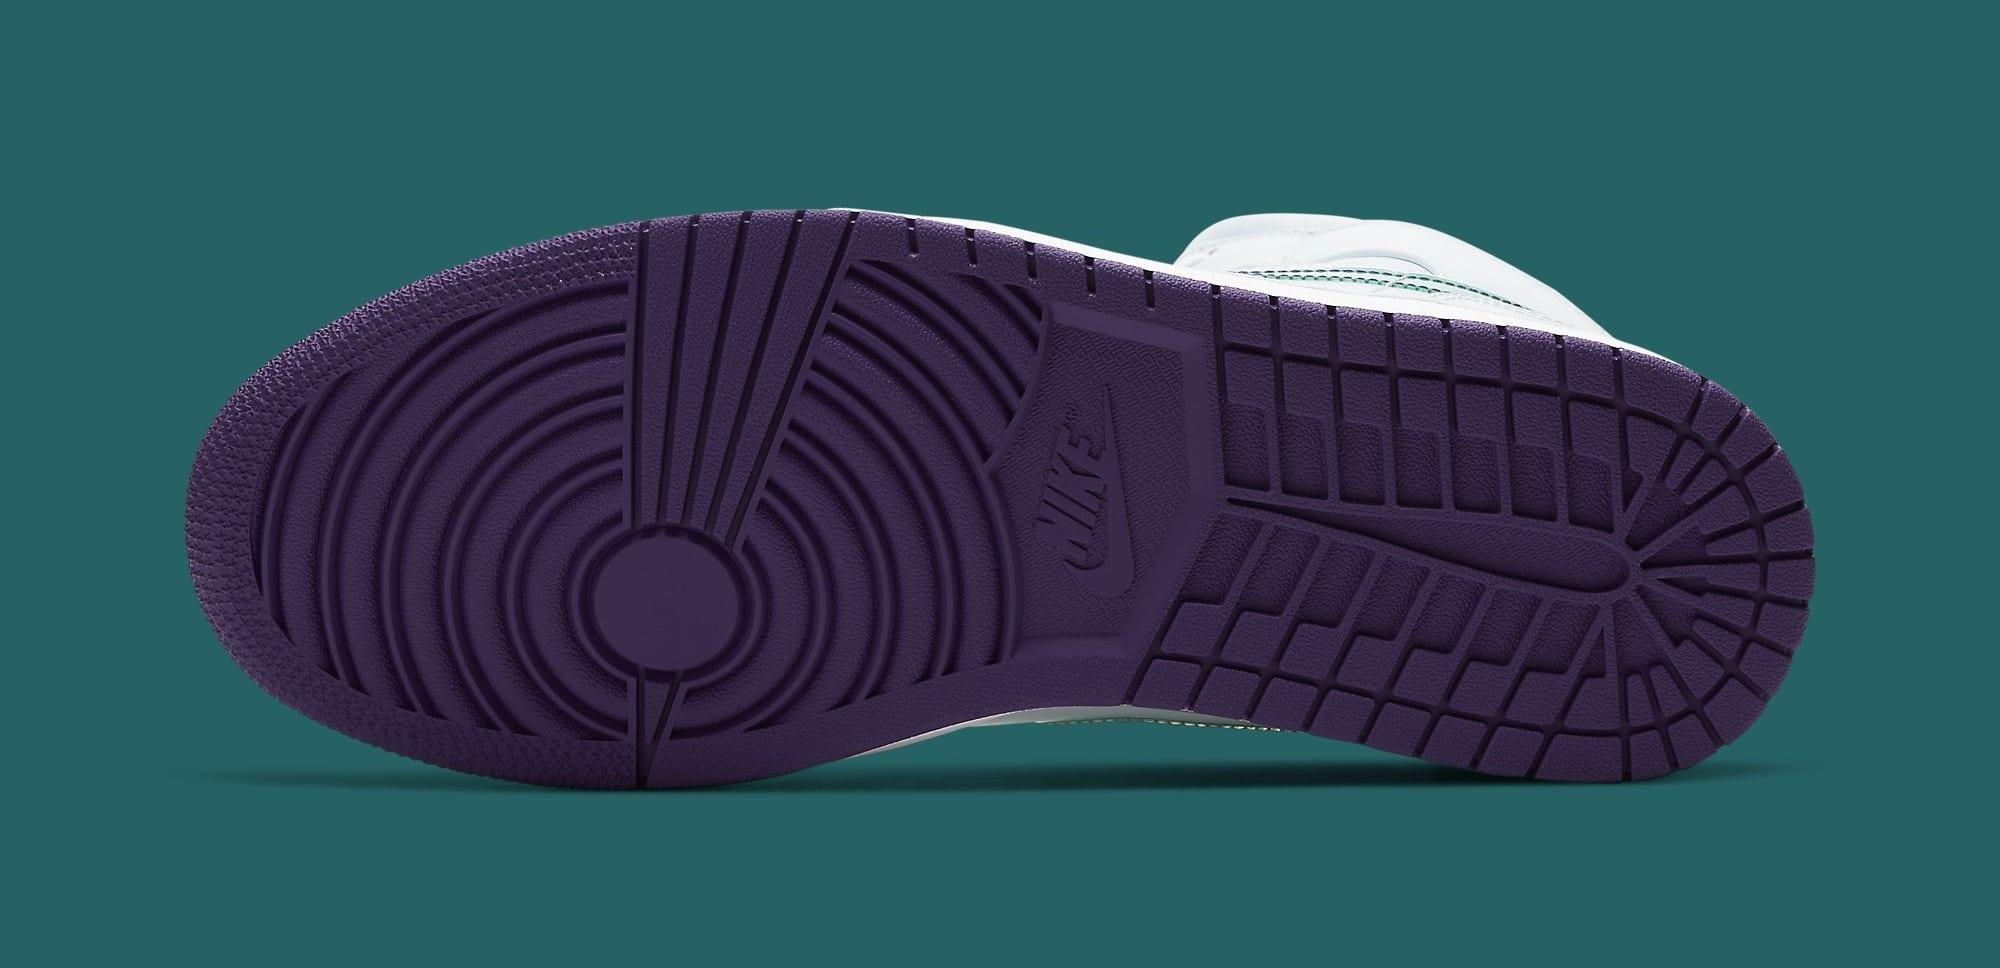 Air Jordan 1 Mid SE 'Nike Hoops' CW5853-100 Outsole